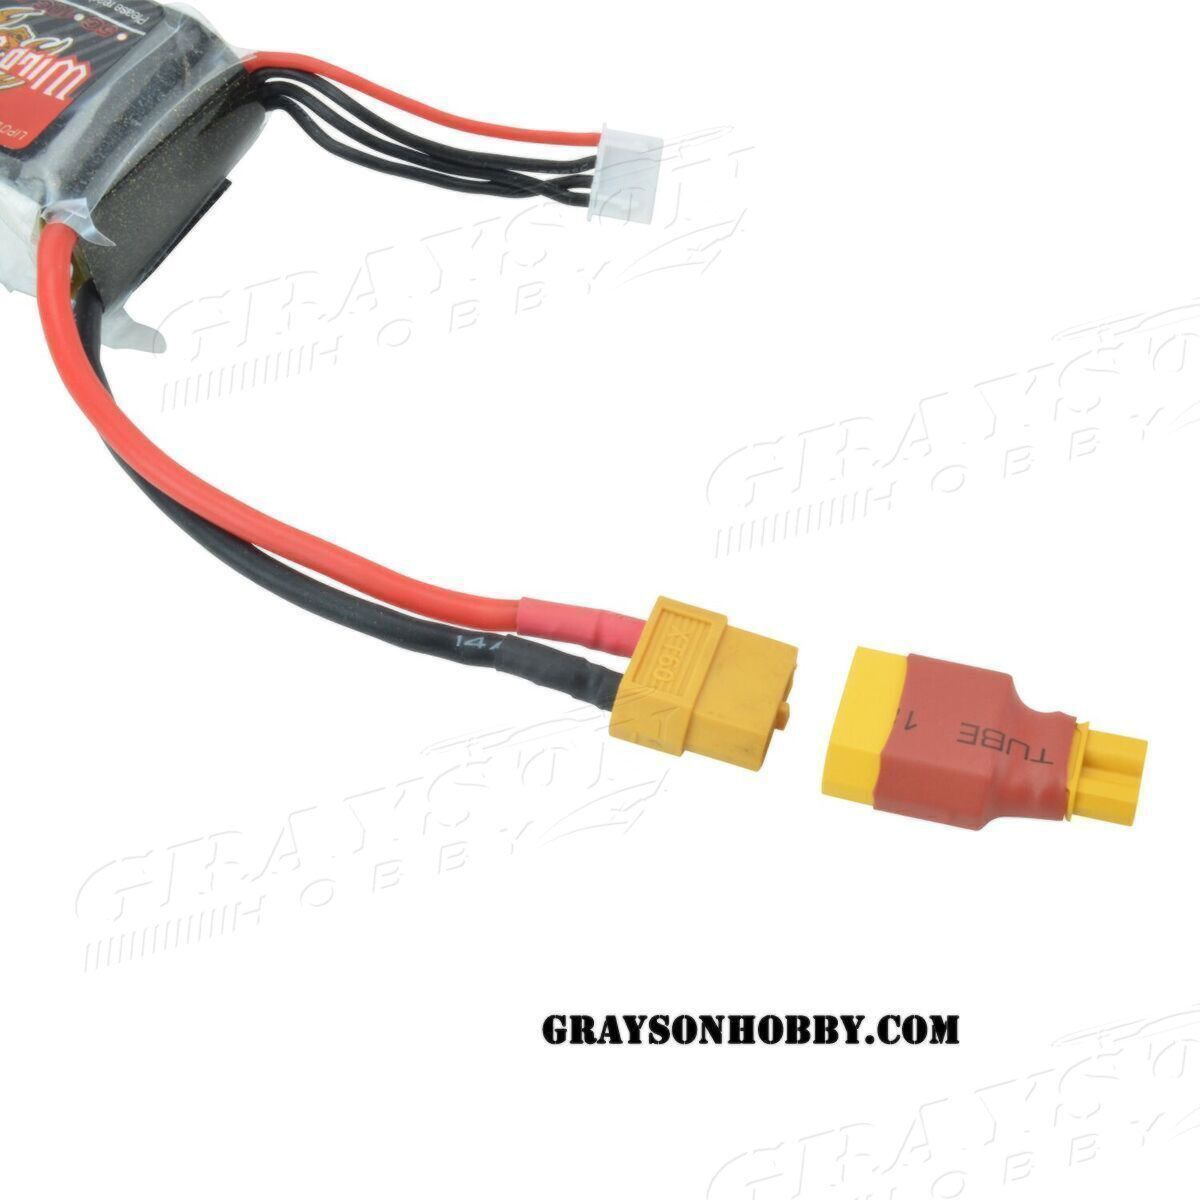 XT60-conversion adaptor